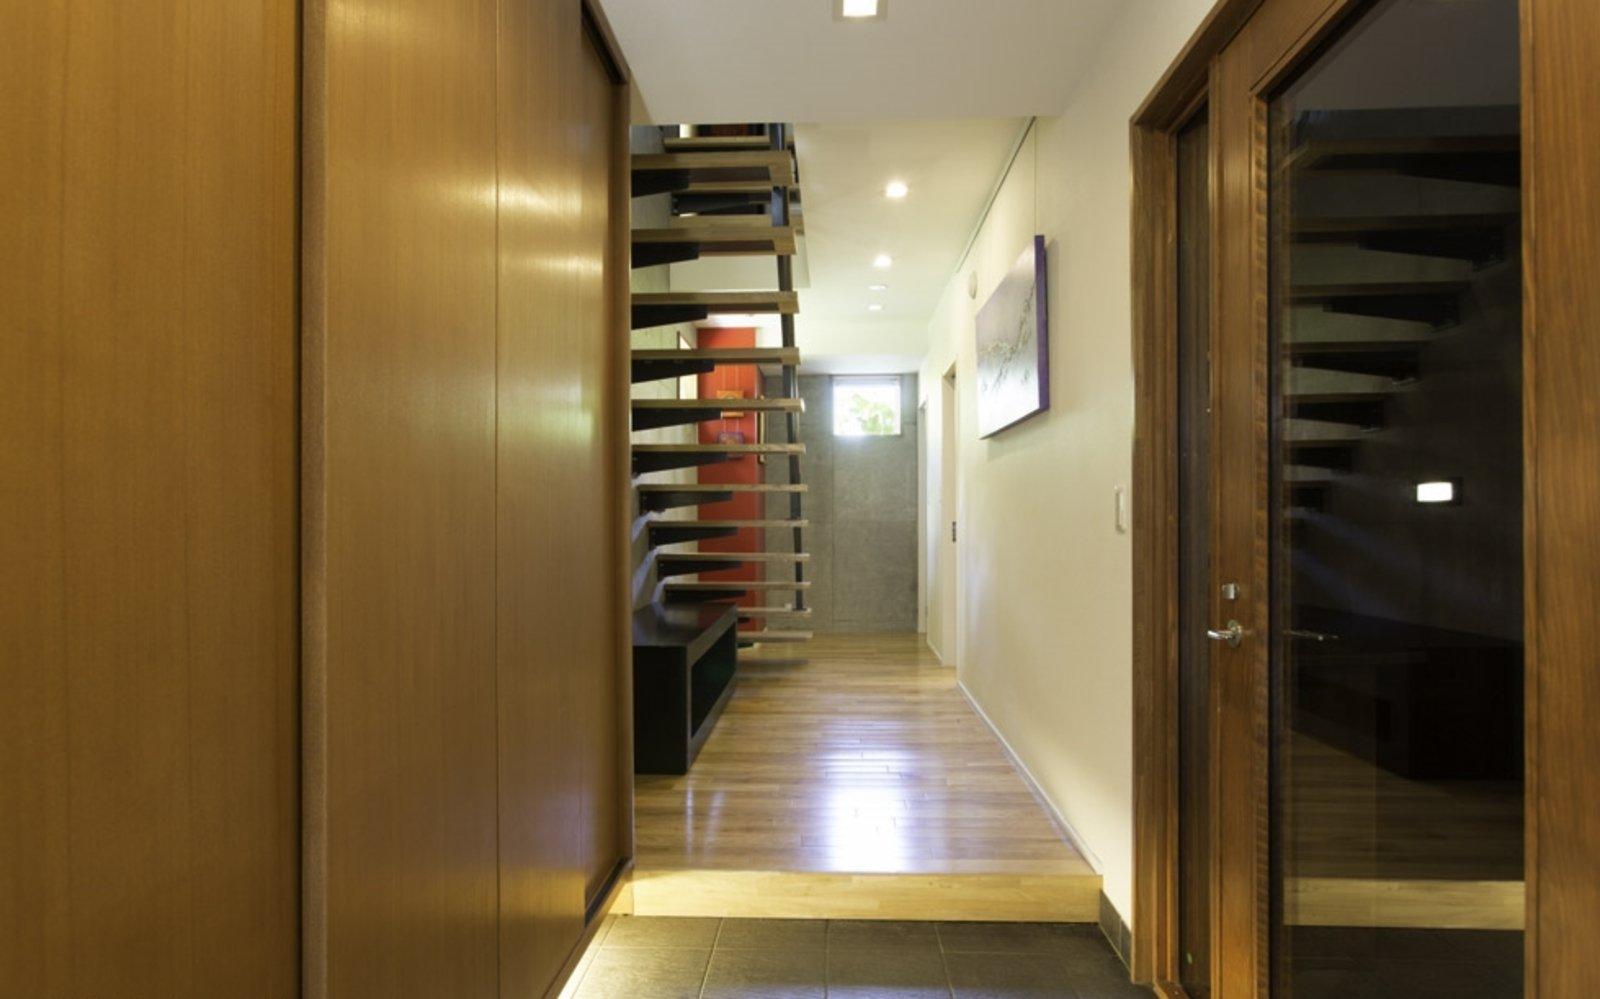 Kon m 3bdr house corridor large